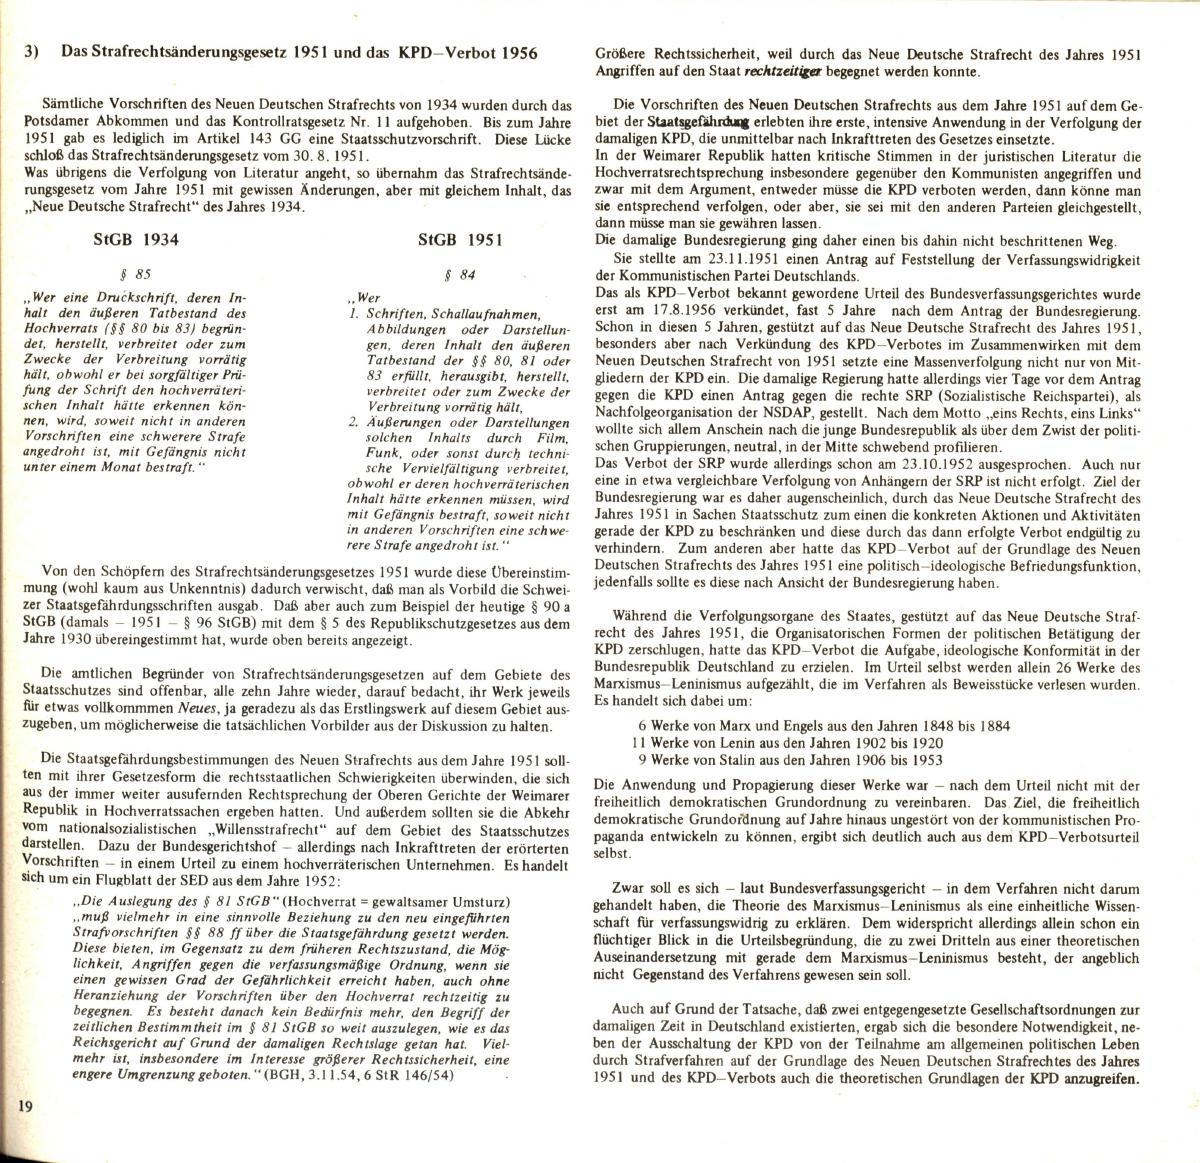 REP_VLB_1976_Die_Zensurgesetze_20